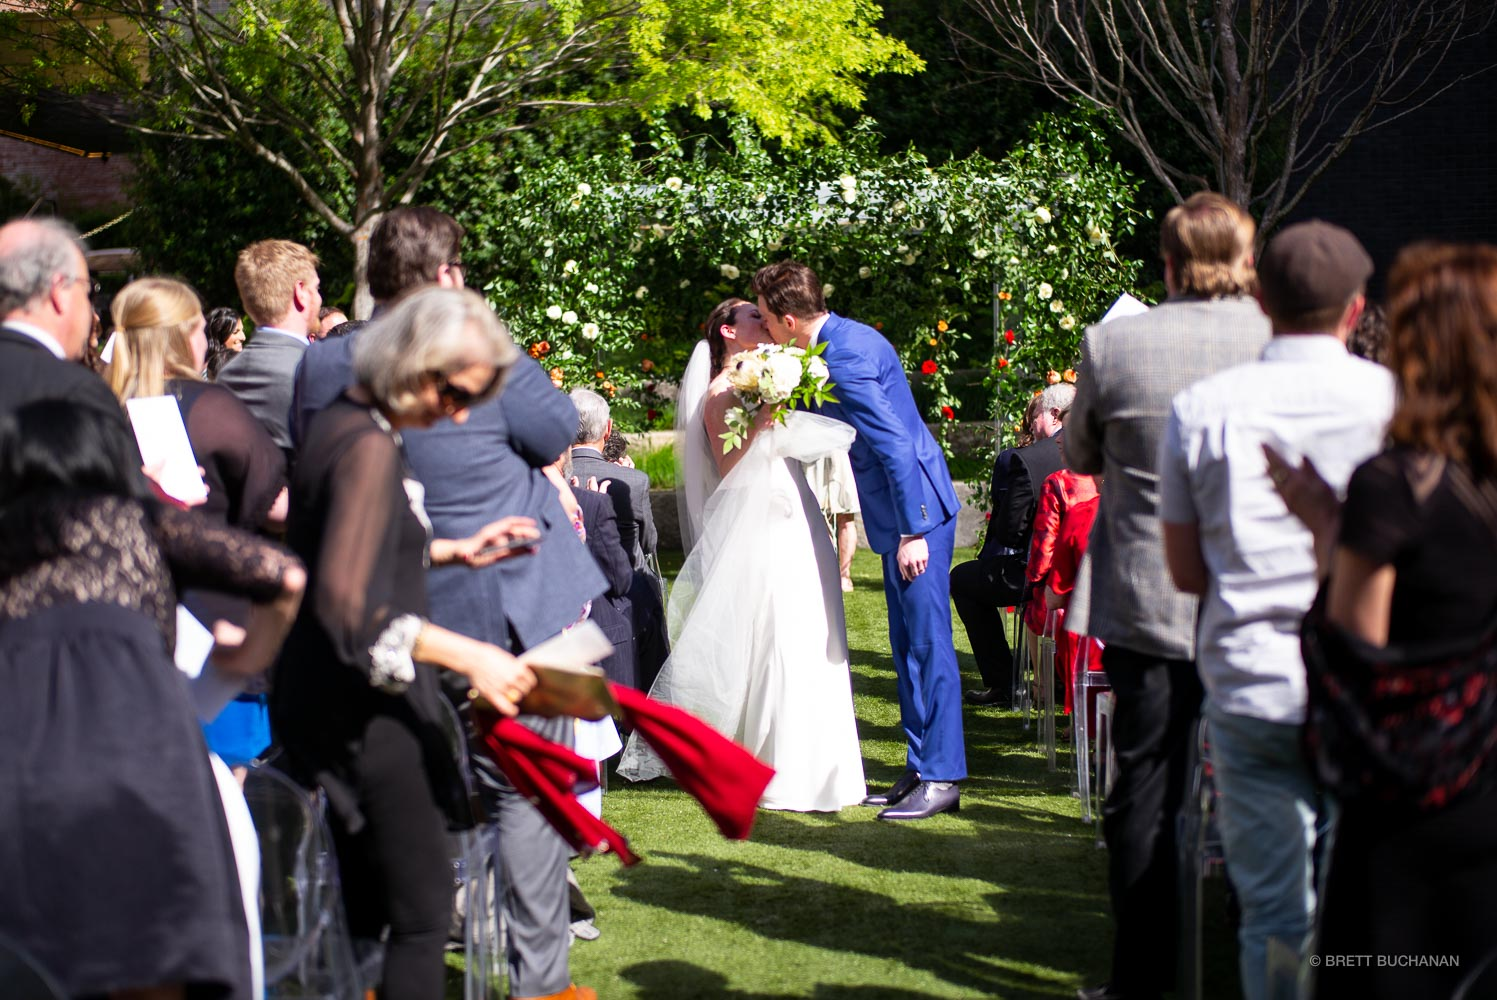 Austin-wedding-photographer-dallas-eyeball-joule-39